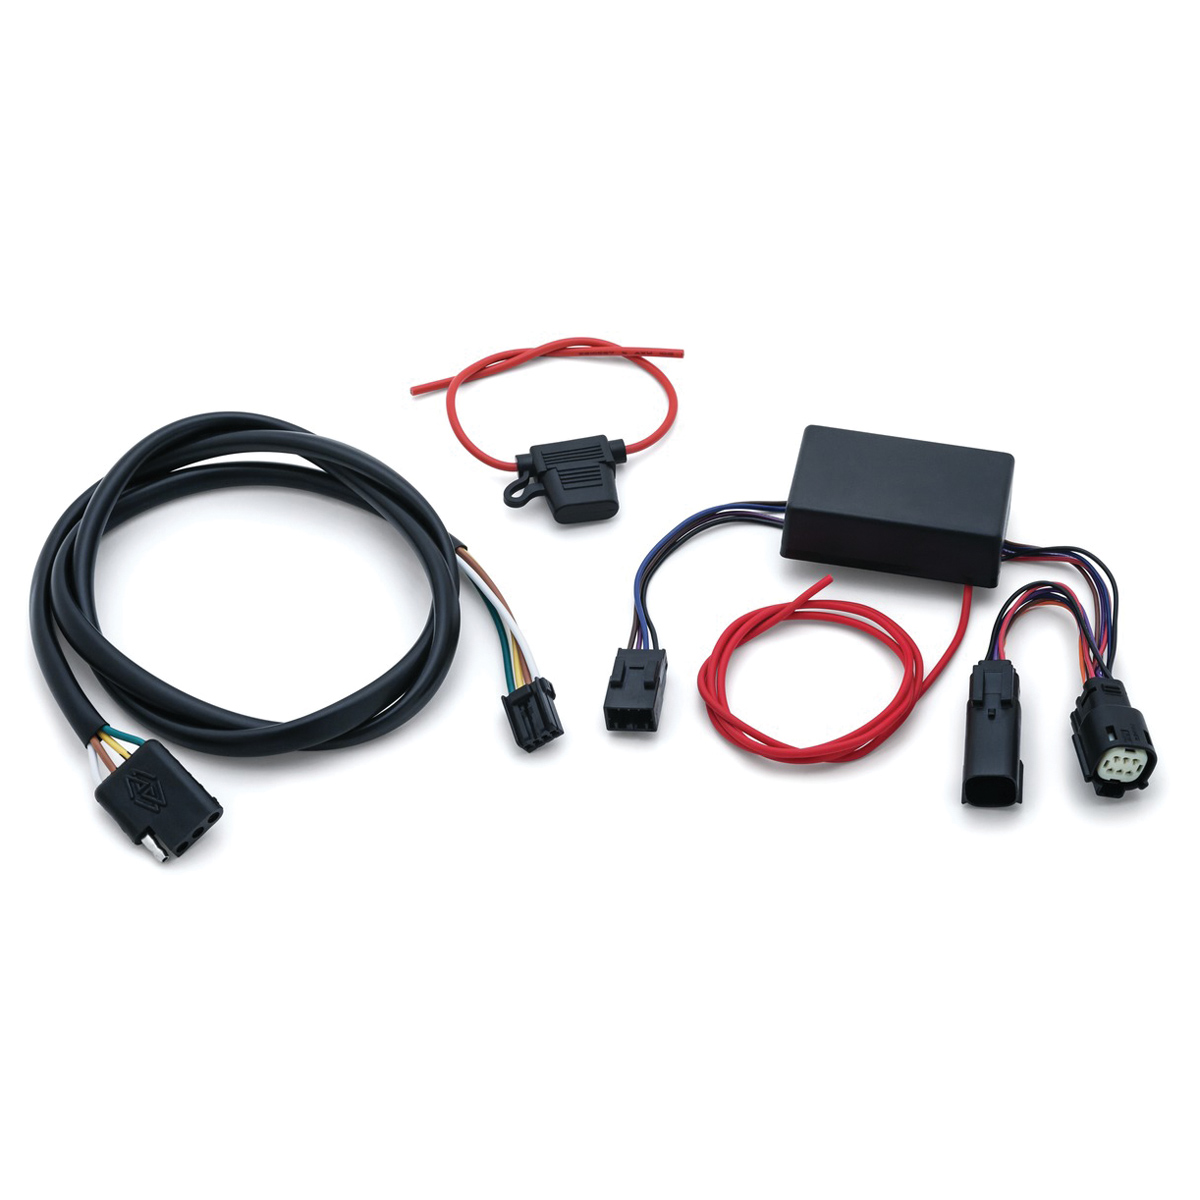 Kuryakyn 4 Wire Trailer Hitch Wiring Kit 912 124 Jp Cycles Harness